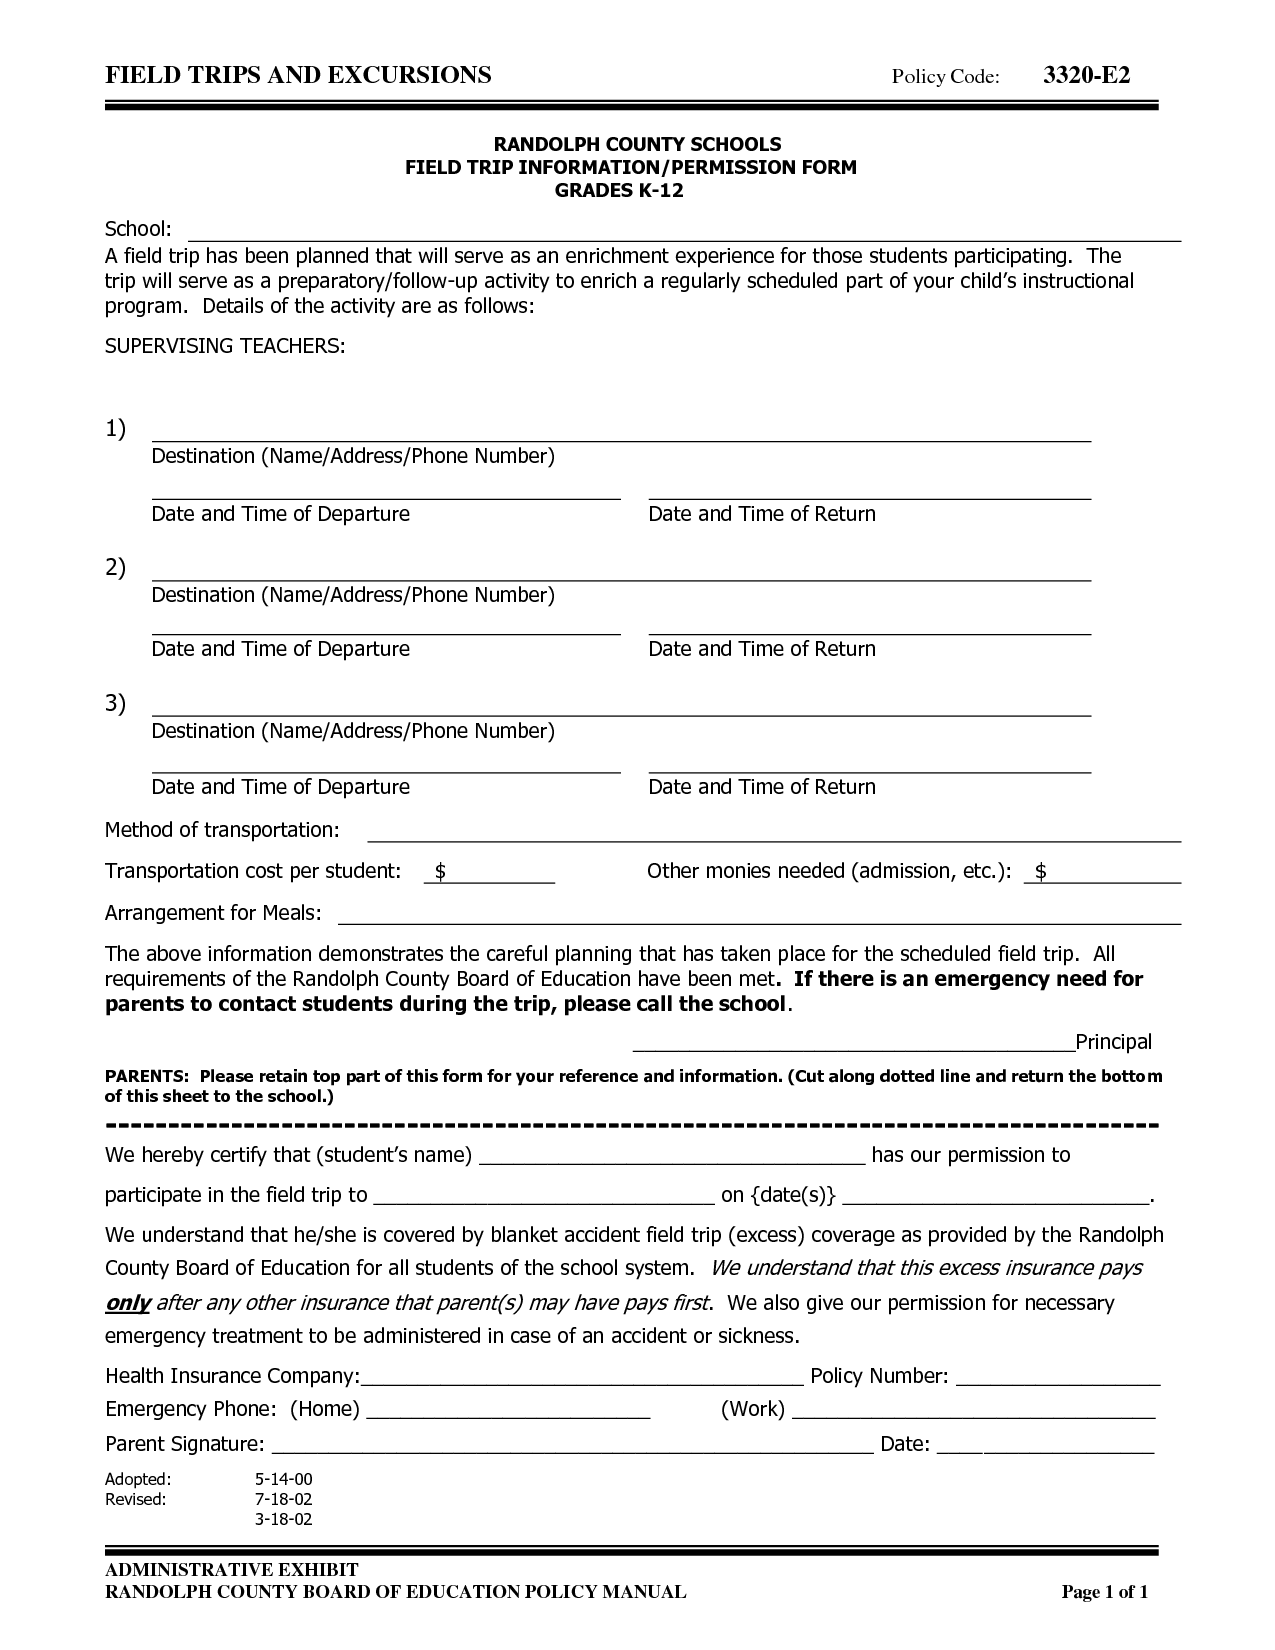 Template permission form template permission 8 permission slip